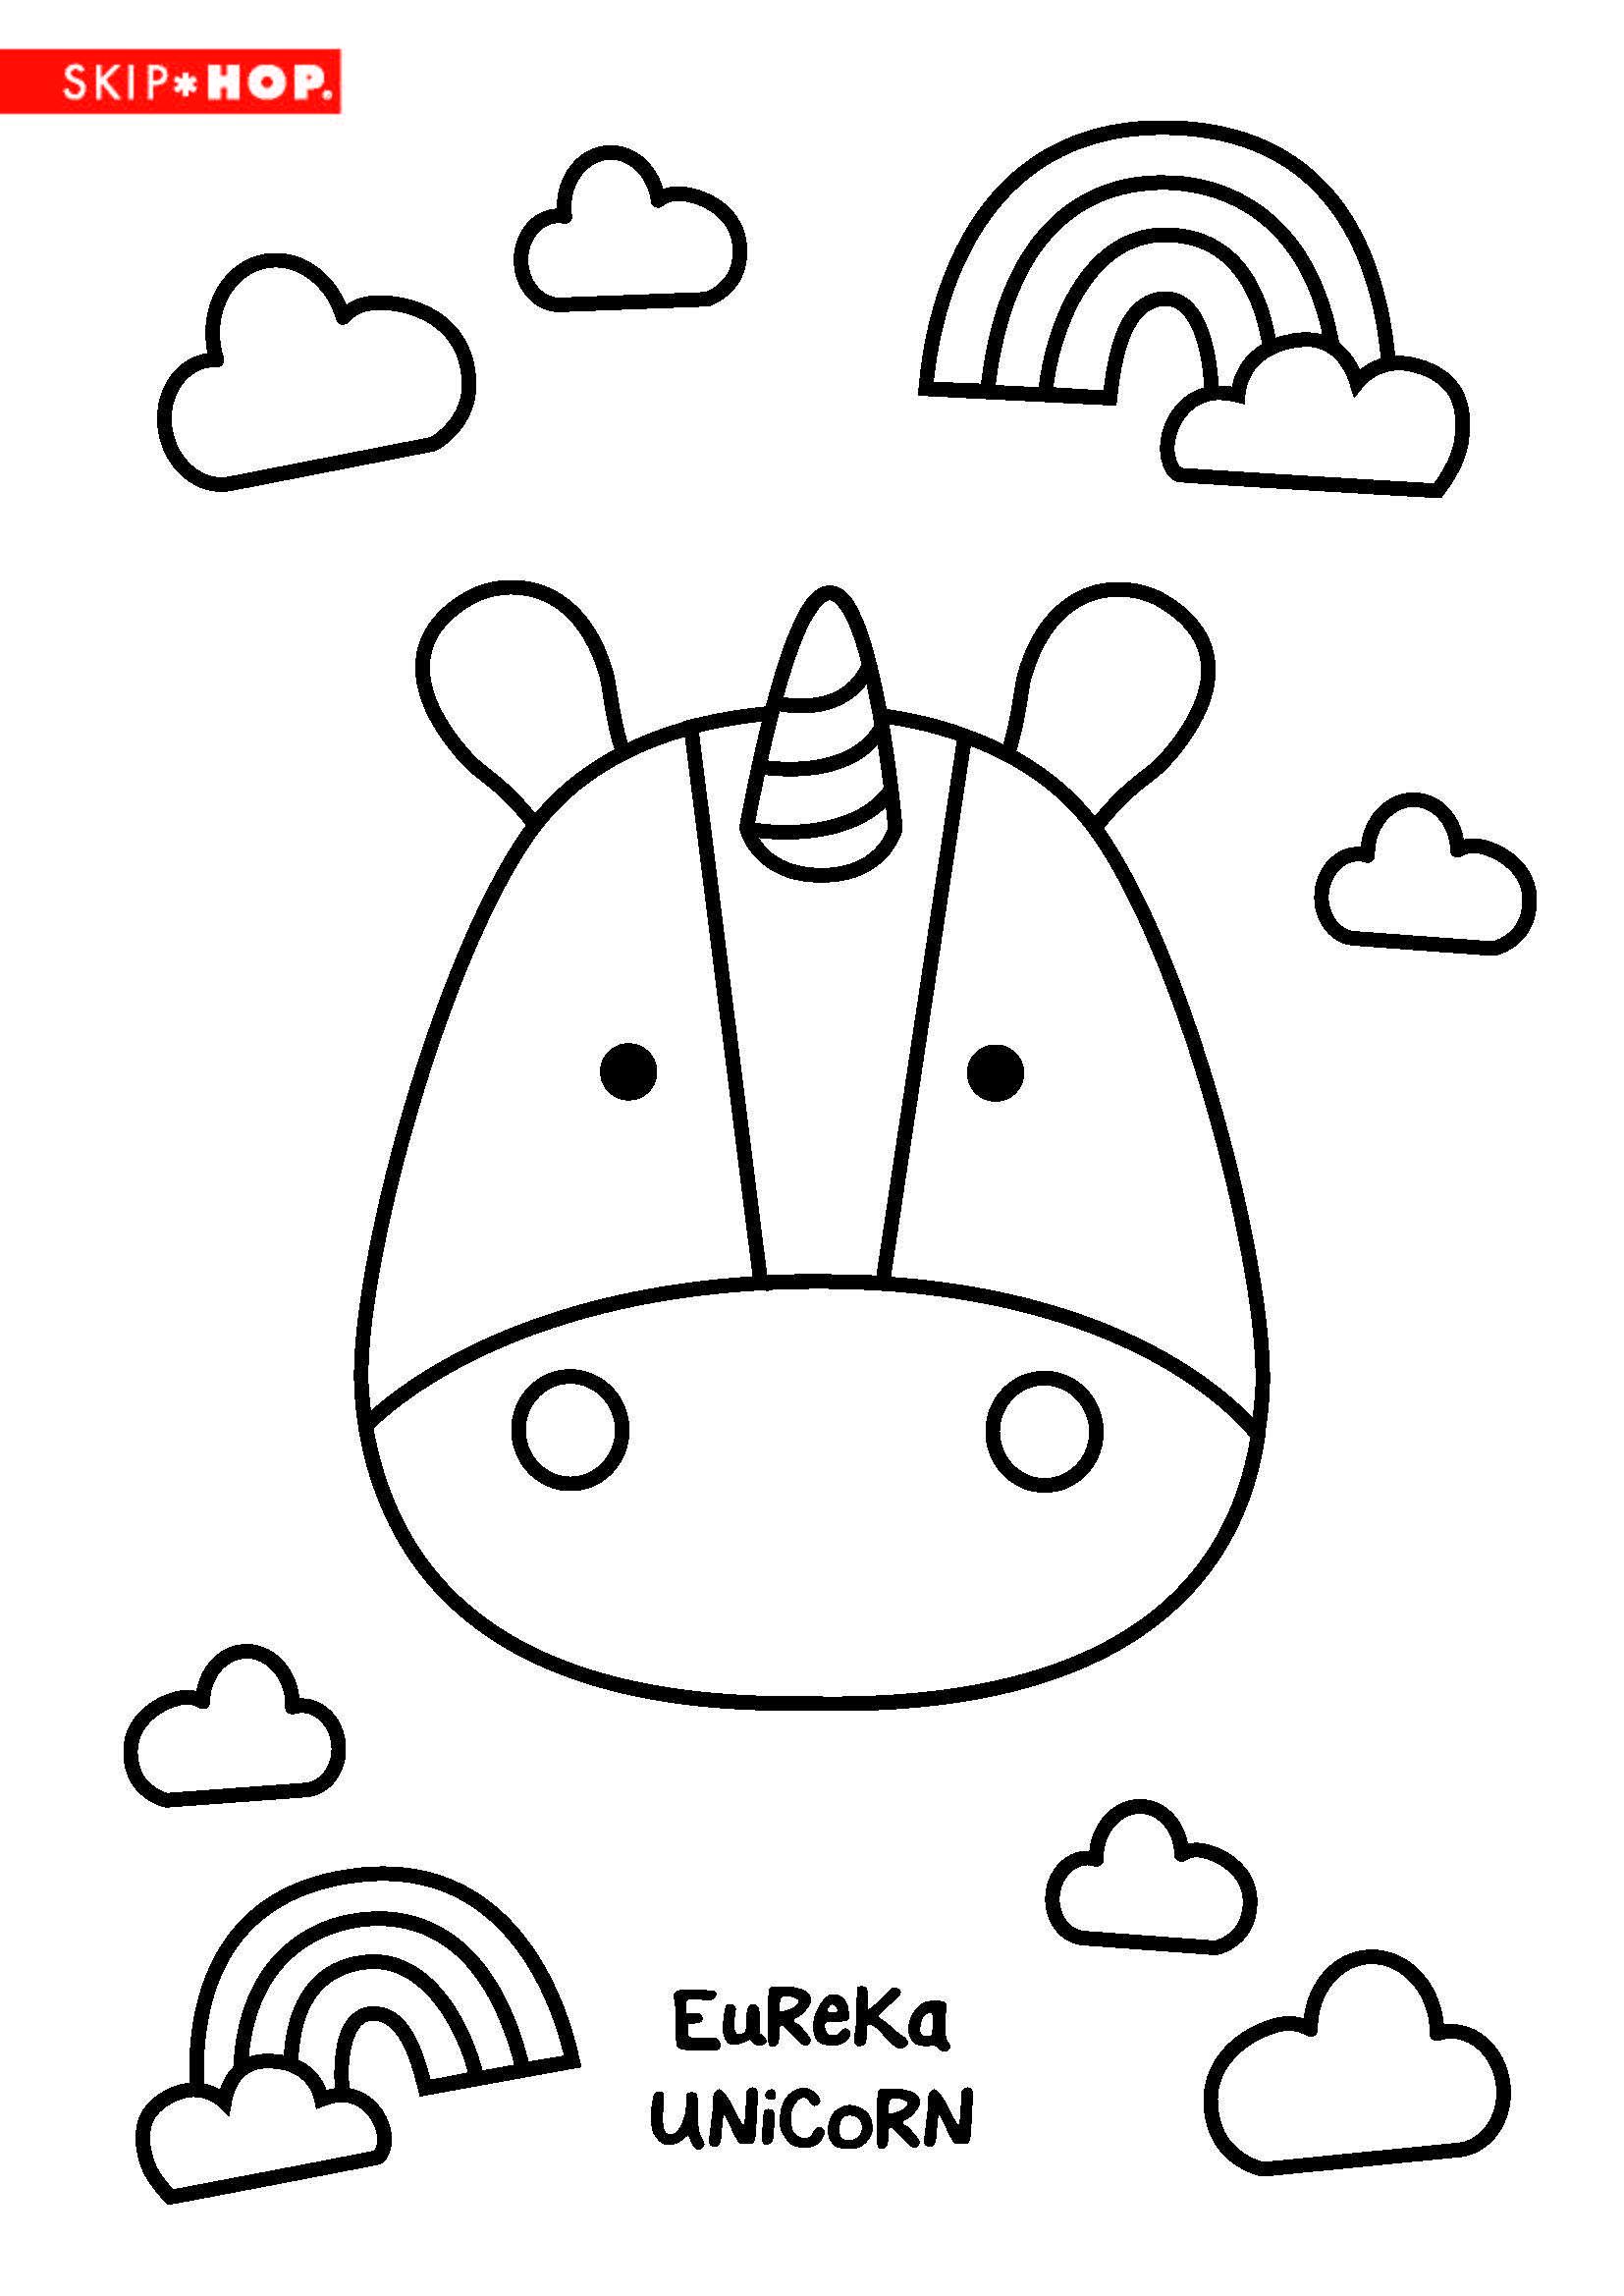 Eureka Unicorn Coloring Sheet Kids Coloring Books Kids Craft Gifts Kids Coloring Book